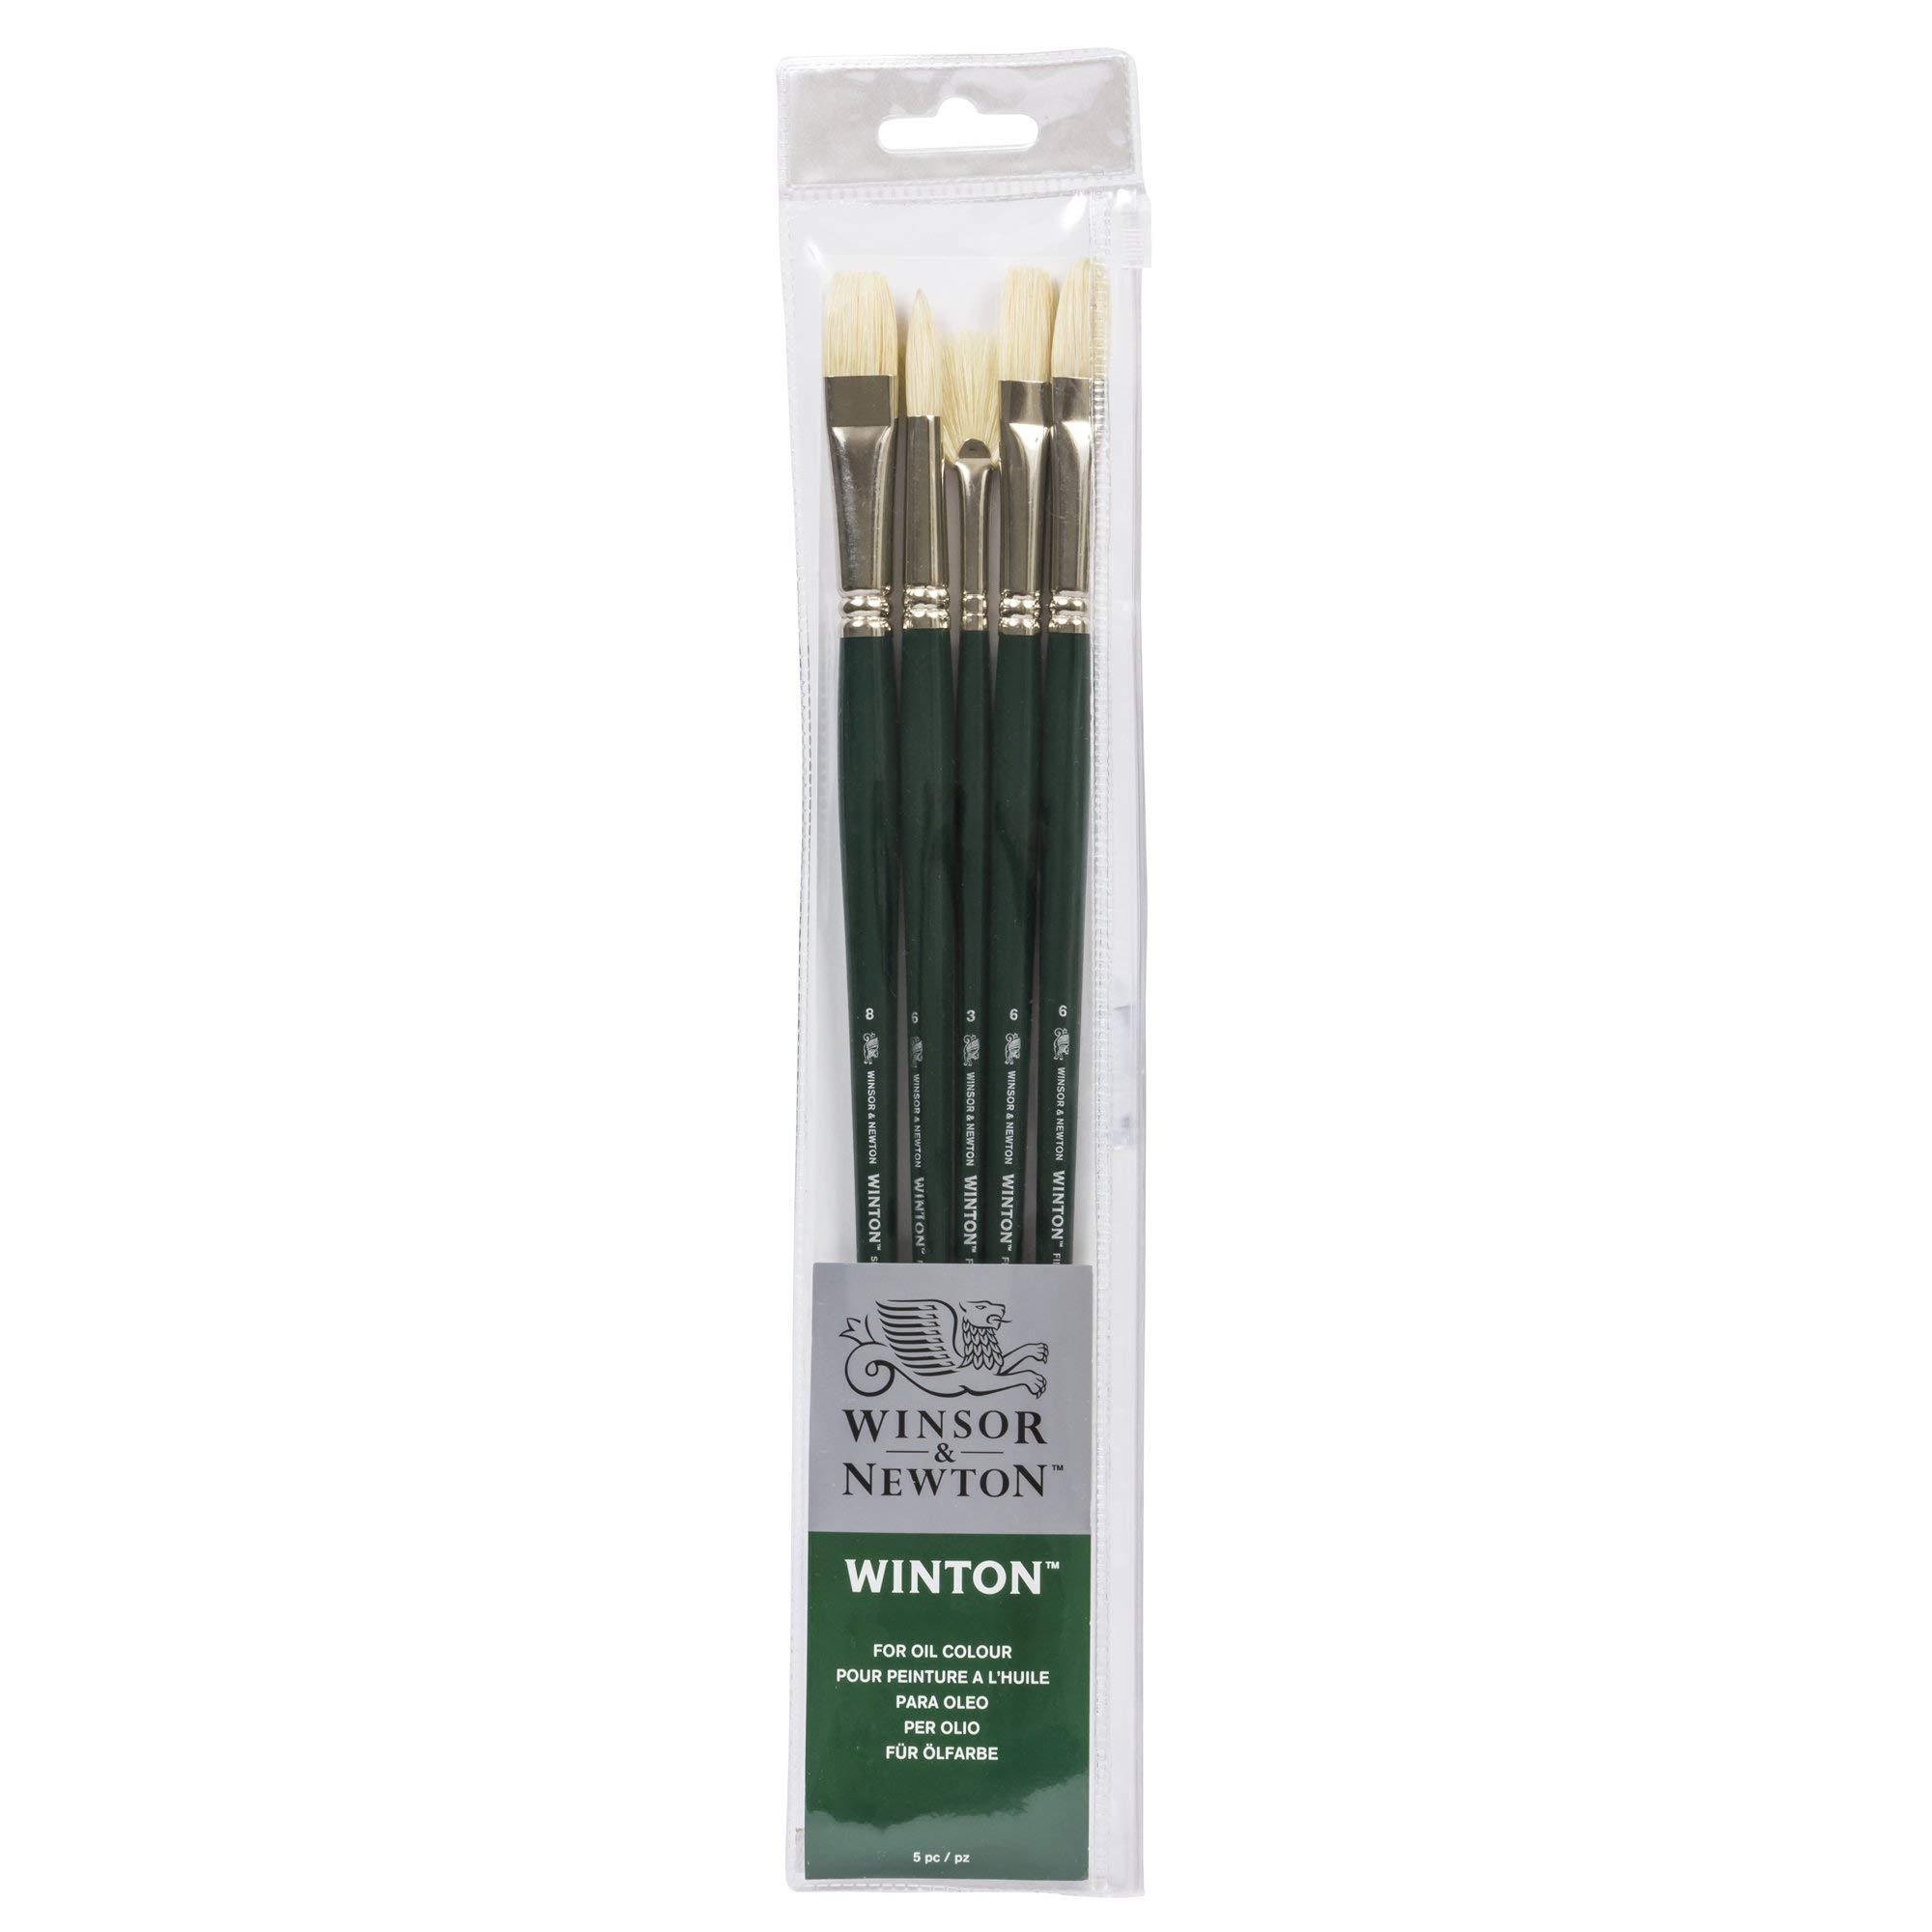 Winsor & Newton Winton Long Handle Brush (5 Pack) (Round 6, Filbert 6, Flat 6, Bright 8, Fan 3) by Winsor & Newton